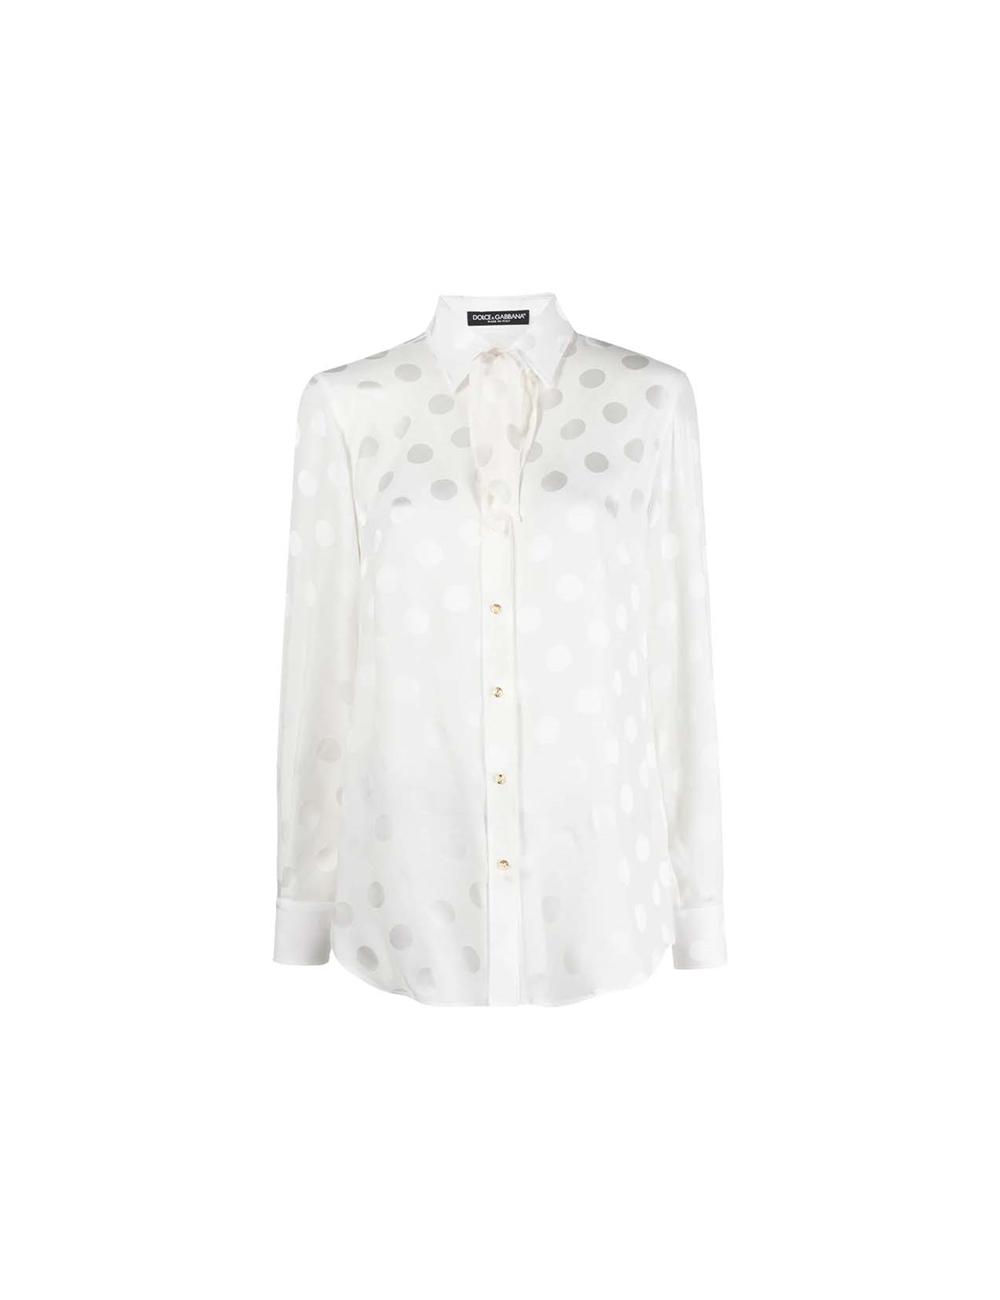 Blouse with dots Dolce & Gabbana - BIG BOSS MEGEVE